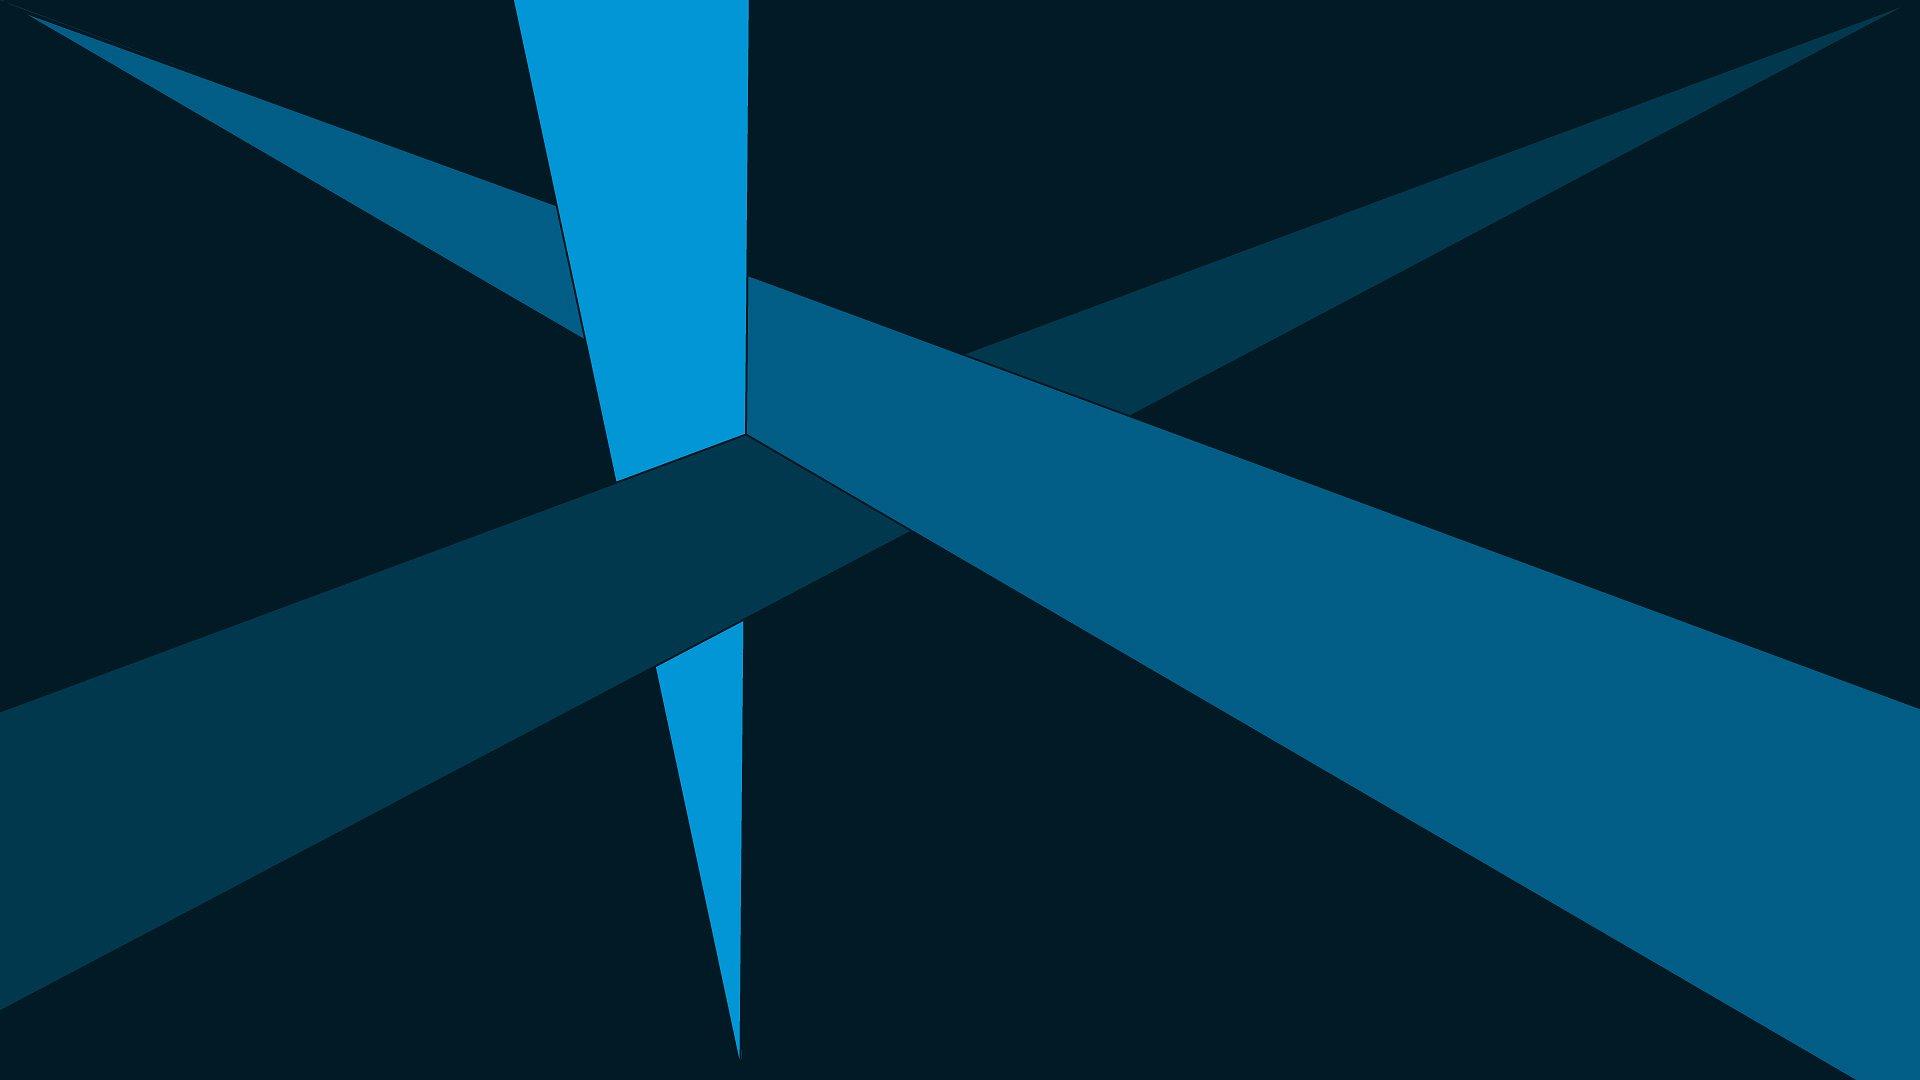 1920x1080 Vector Blue Lines Background Wallpaper 1920x1080 439461